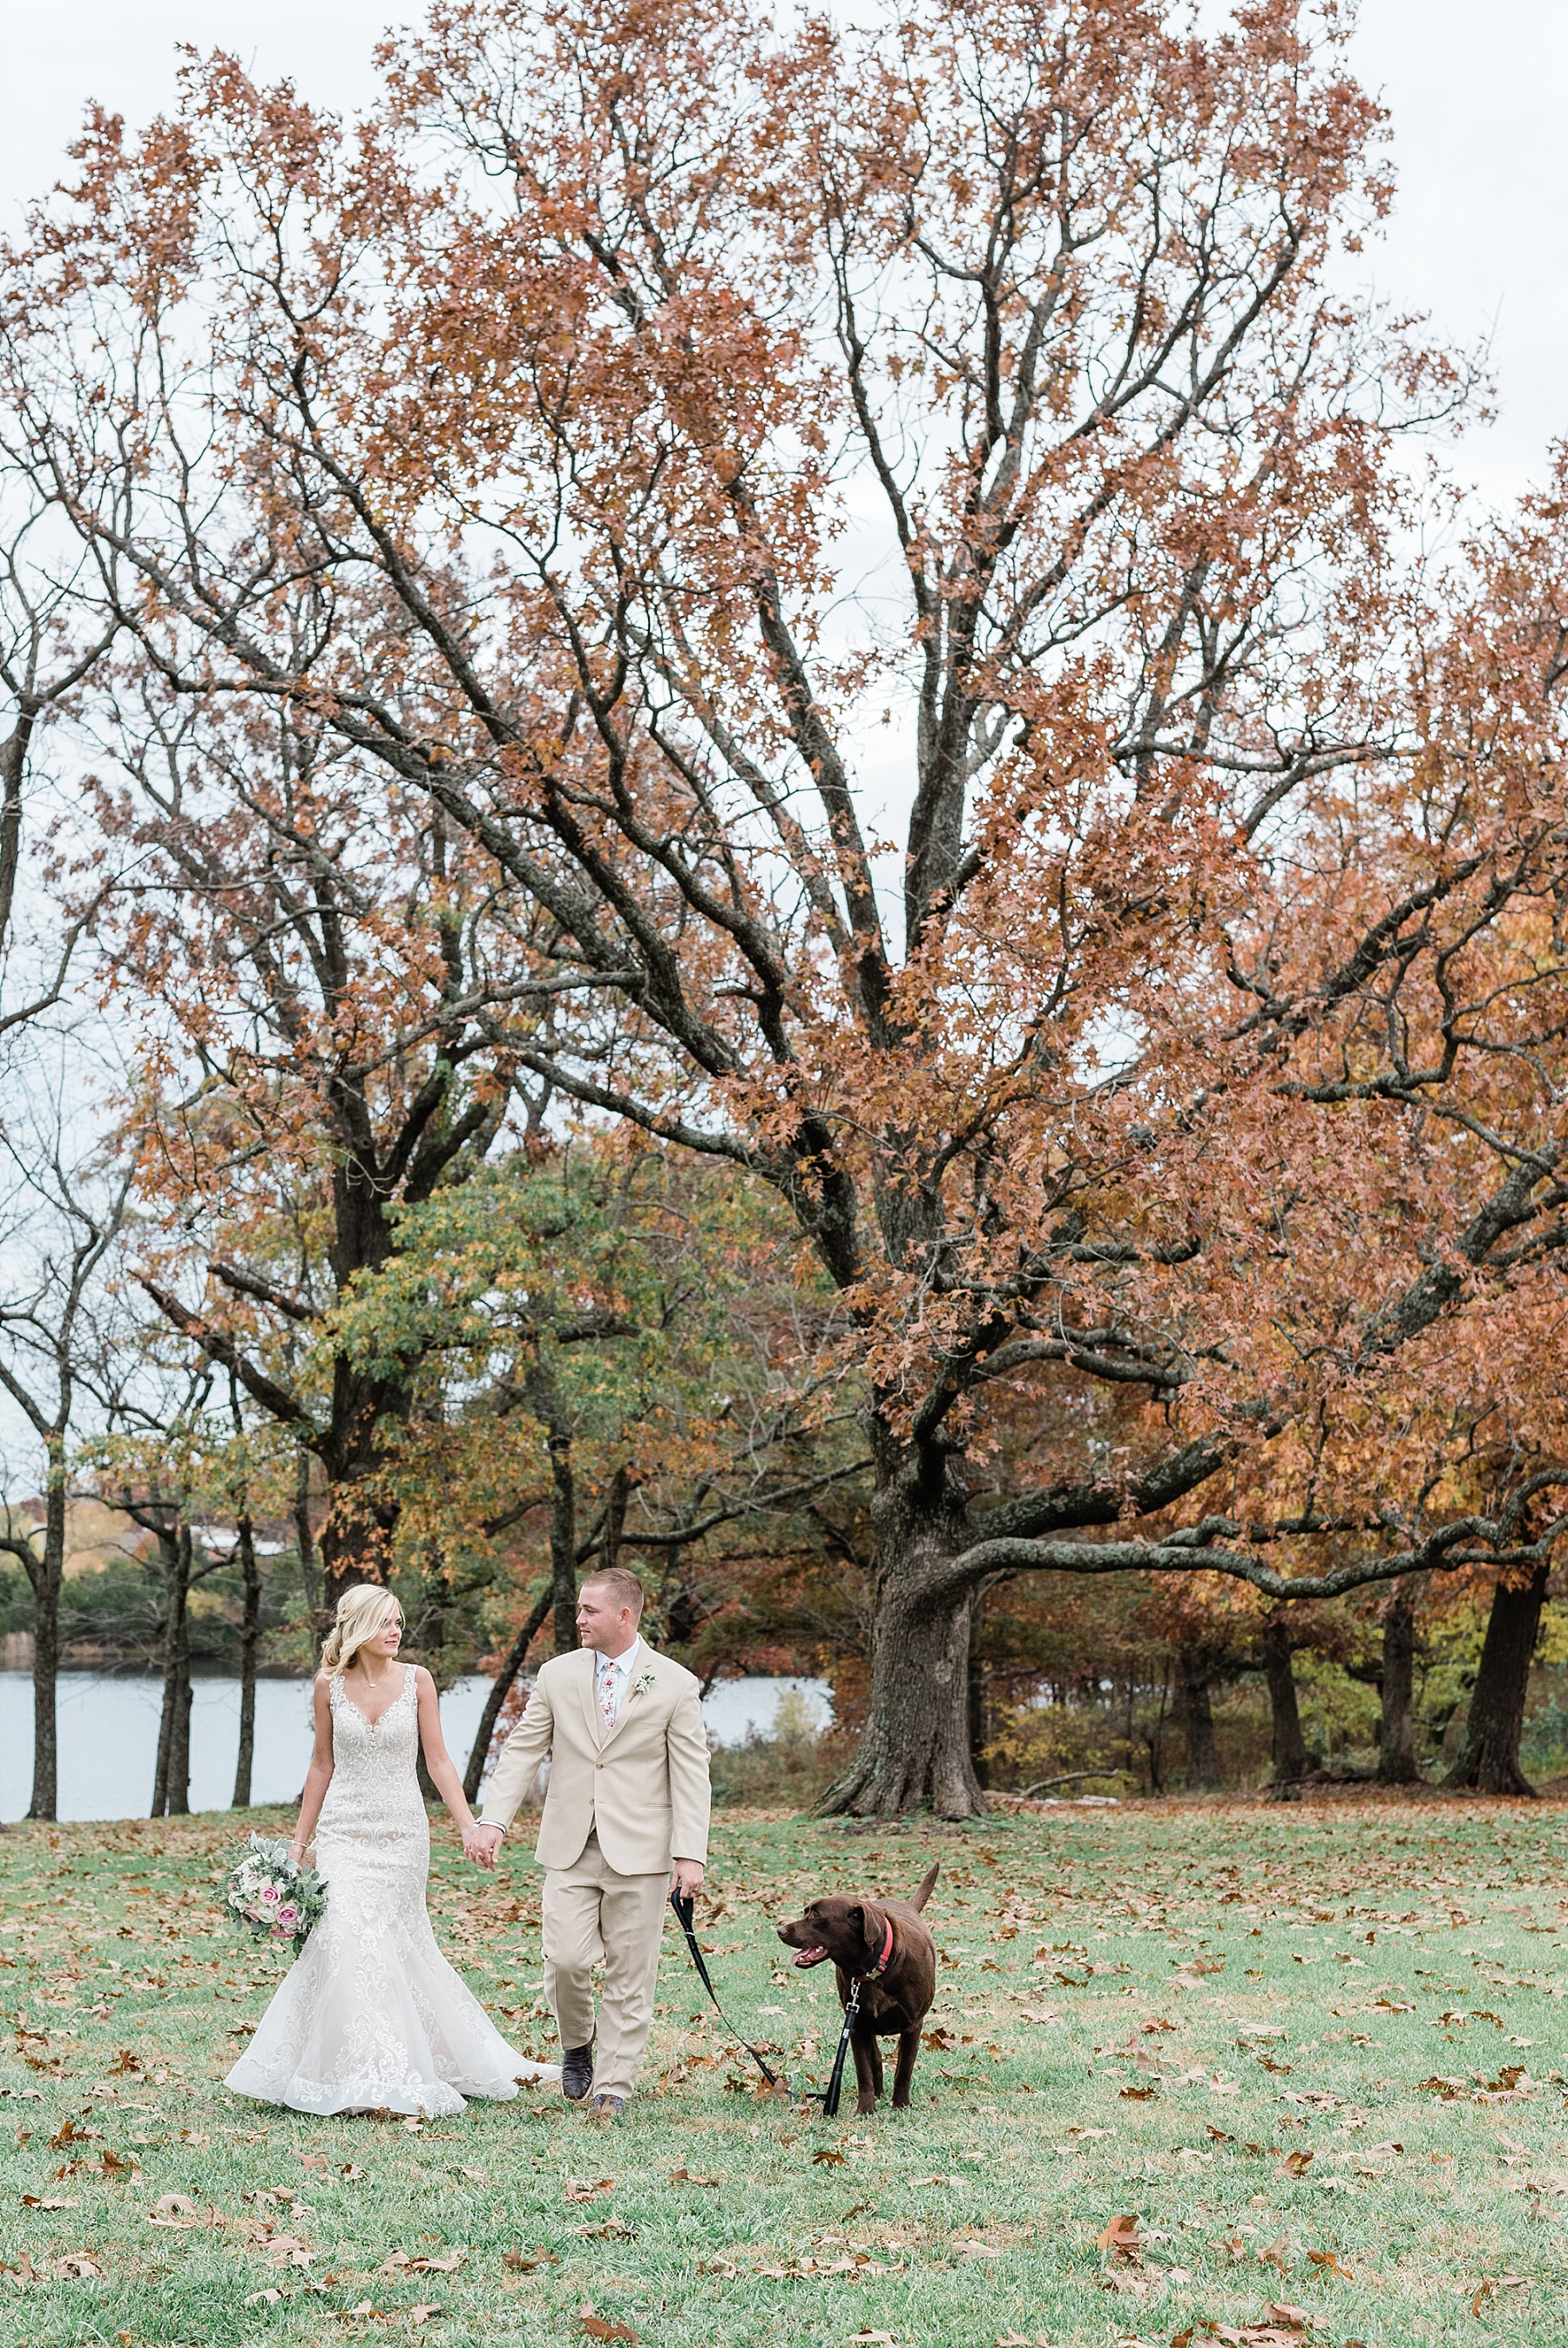 Lakeside Wedding in Fall at Mighty Oak Lodge by Misouri Wedding Photographer Kelsi Kliethermes Photography_0038.jpg